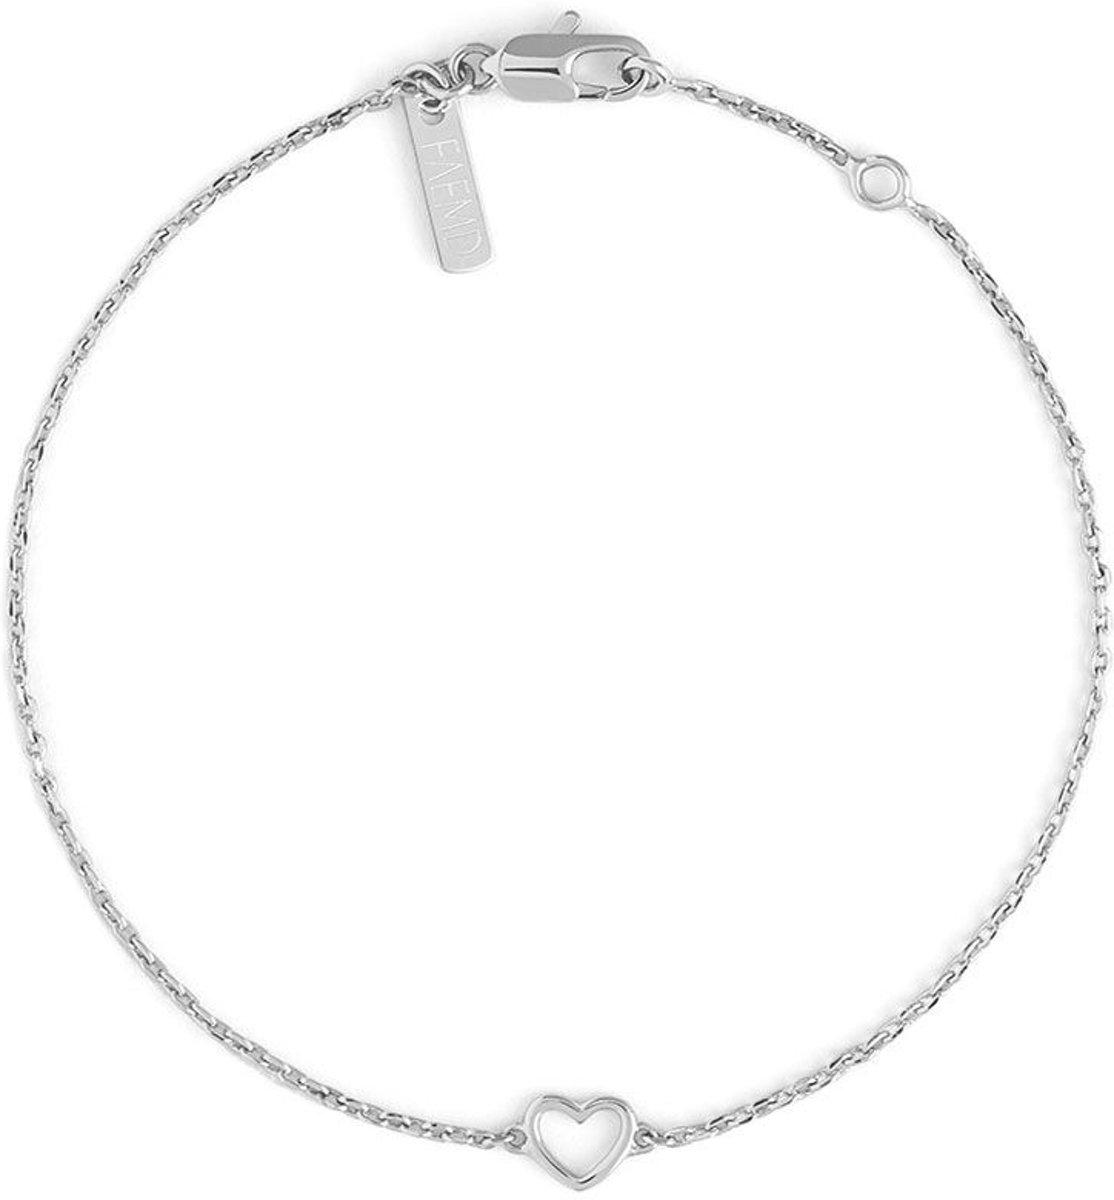 FAEMD Heart Bracelet - Dames - Armband - Zilver - Minimalistisch